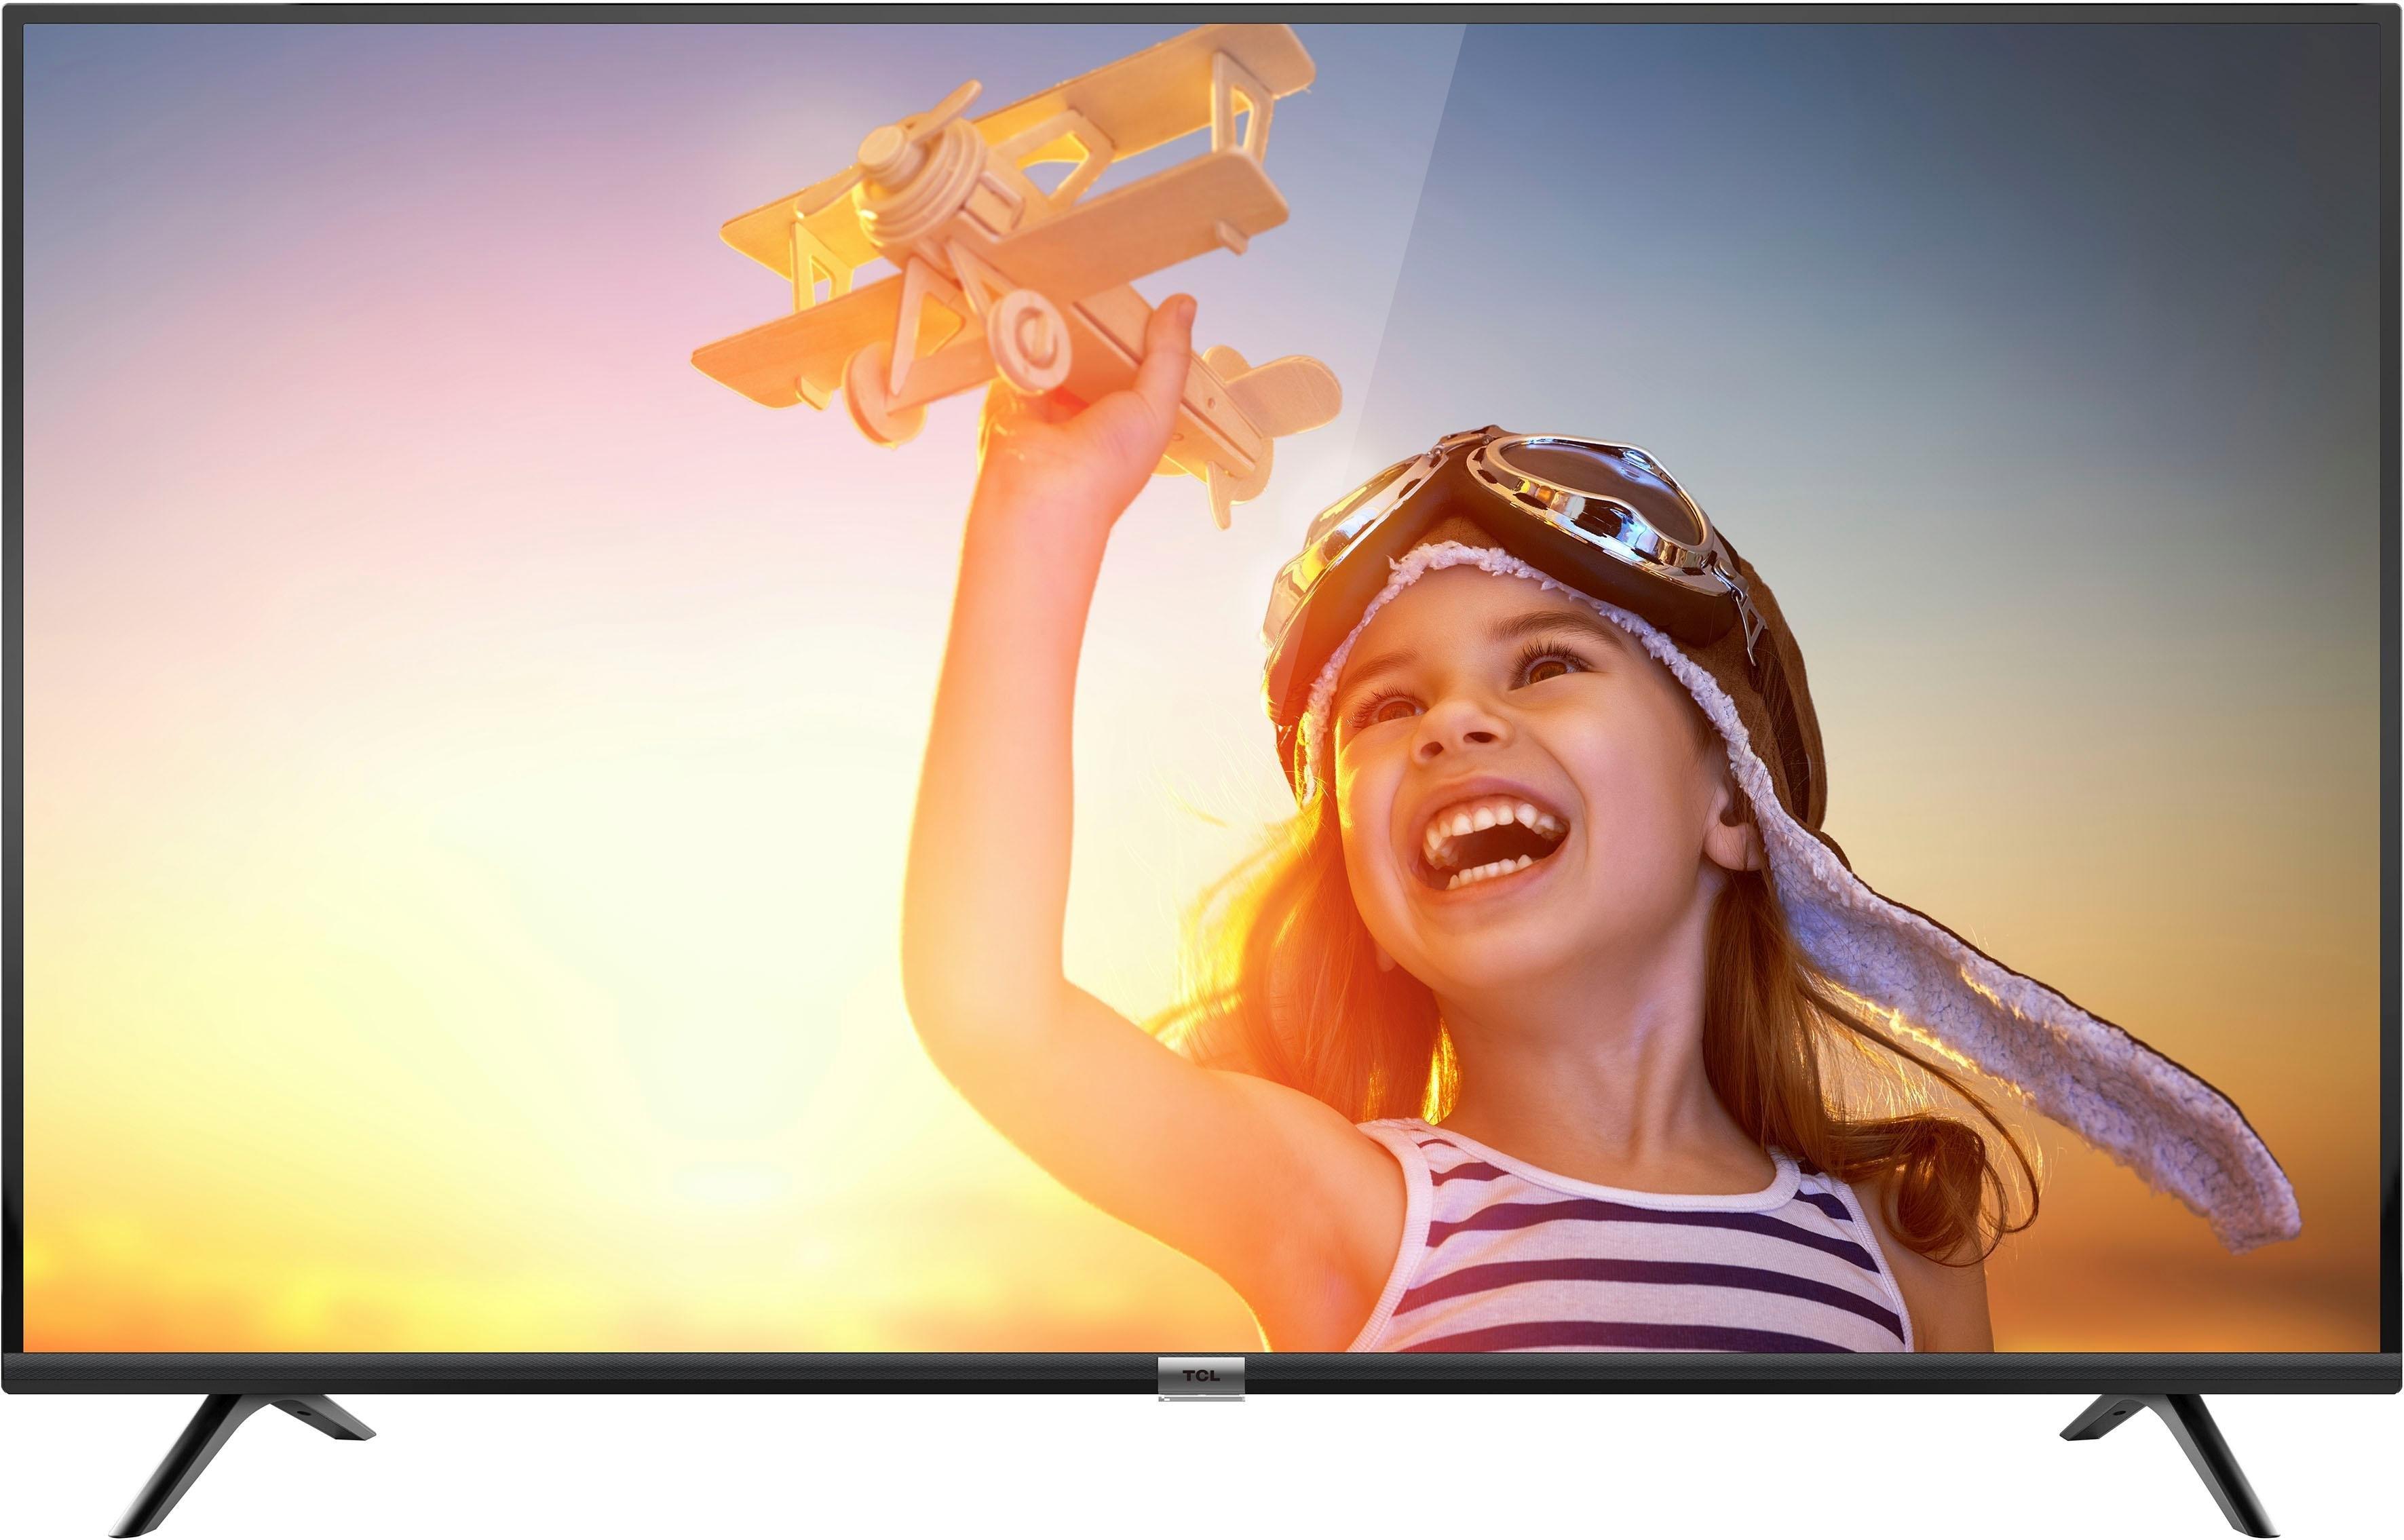 Tcl 50DB600 led-tv (126 cm / 50 inch), 4K Ultra HD, smart-tv online kopen op otto.nl